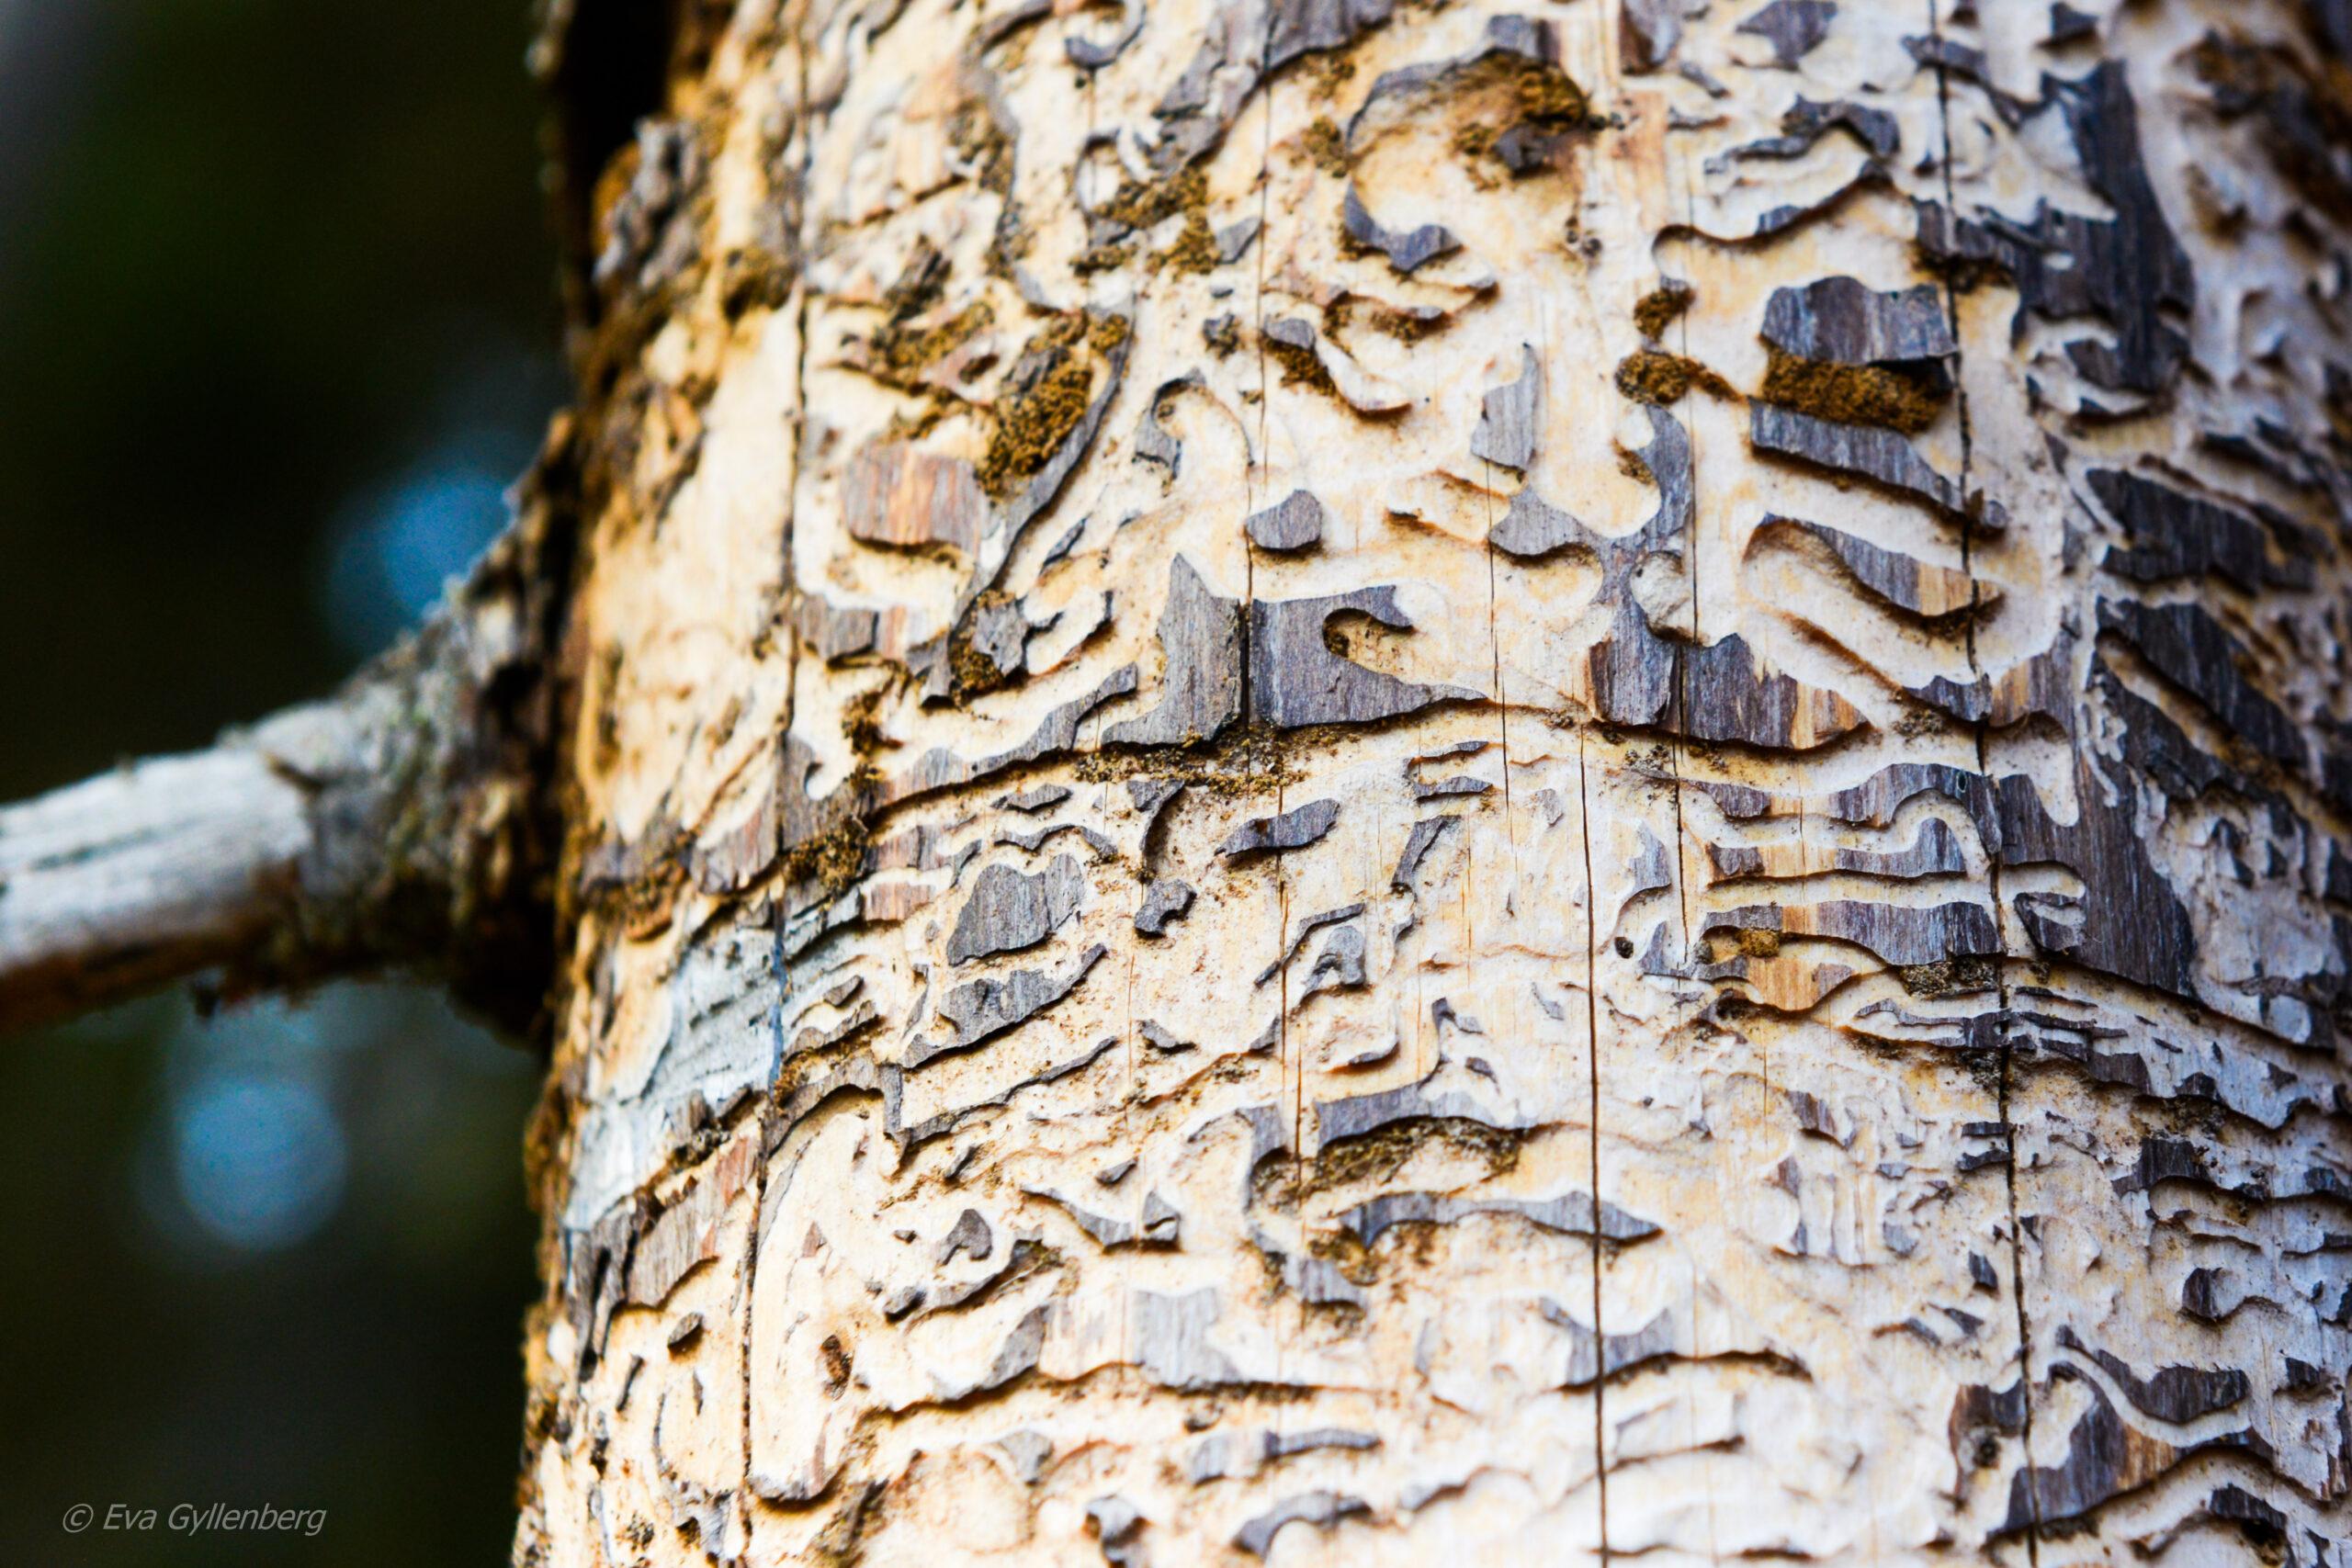 Tyresta nationalpark: Bark